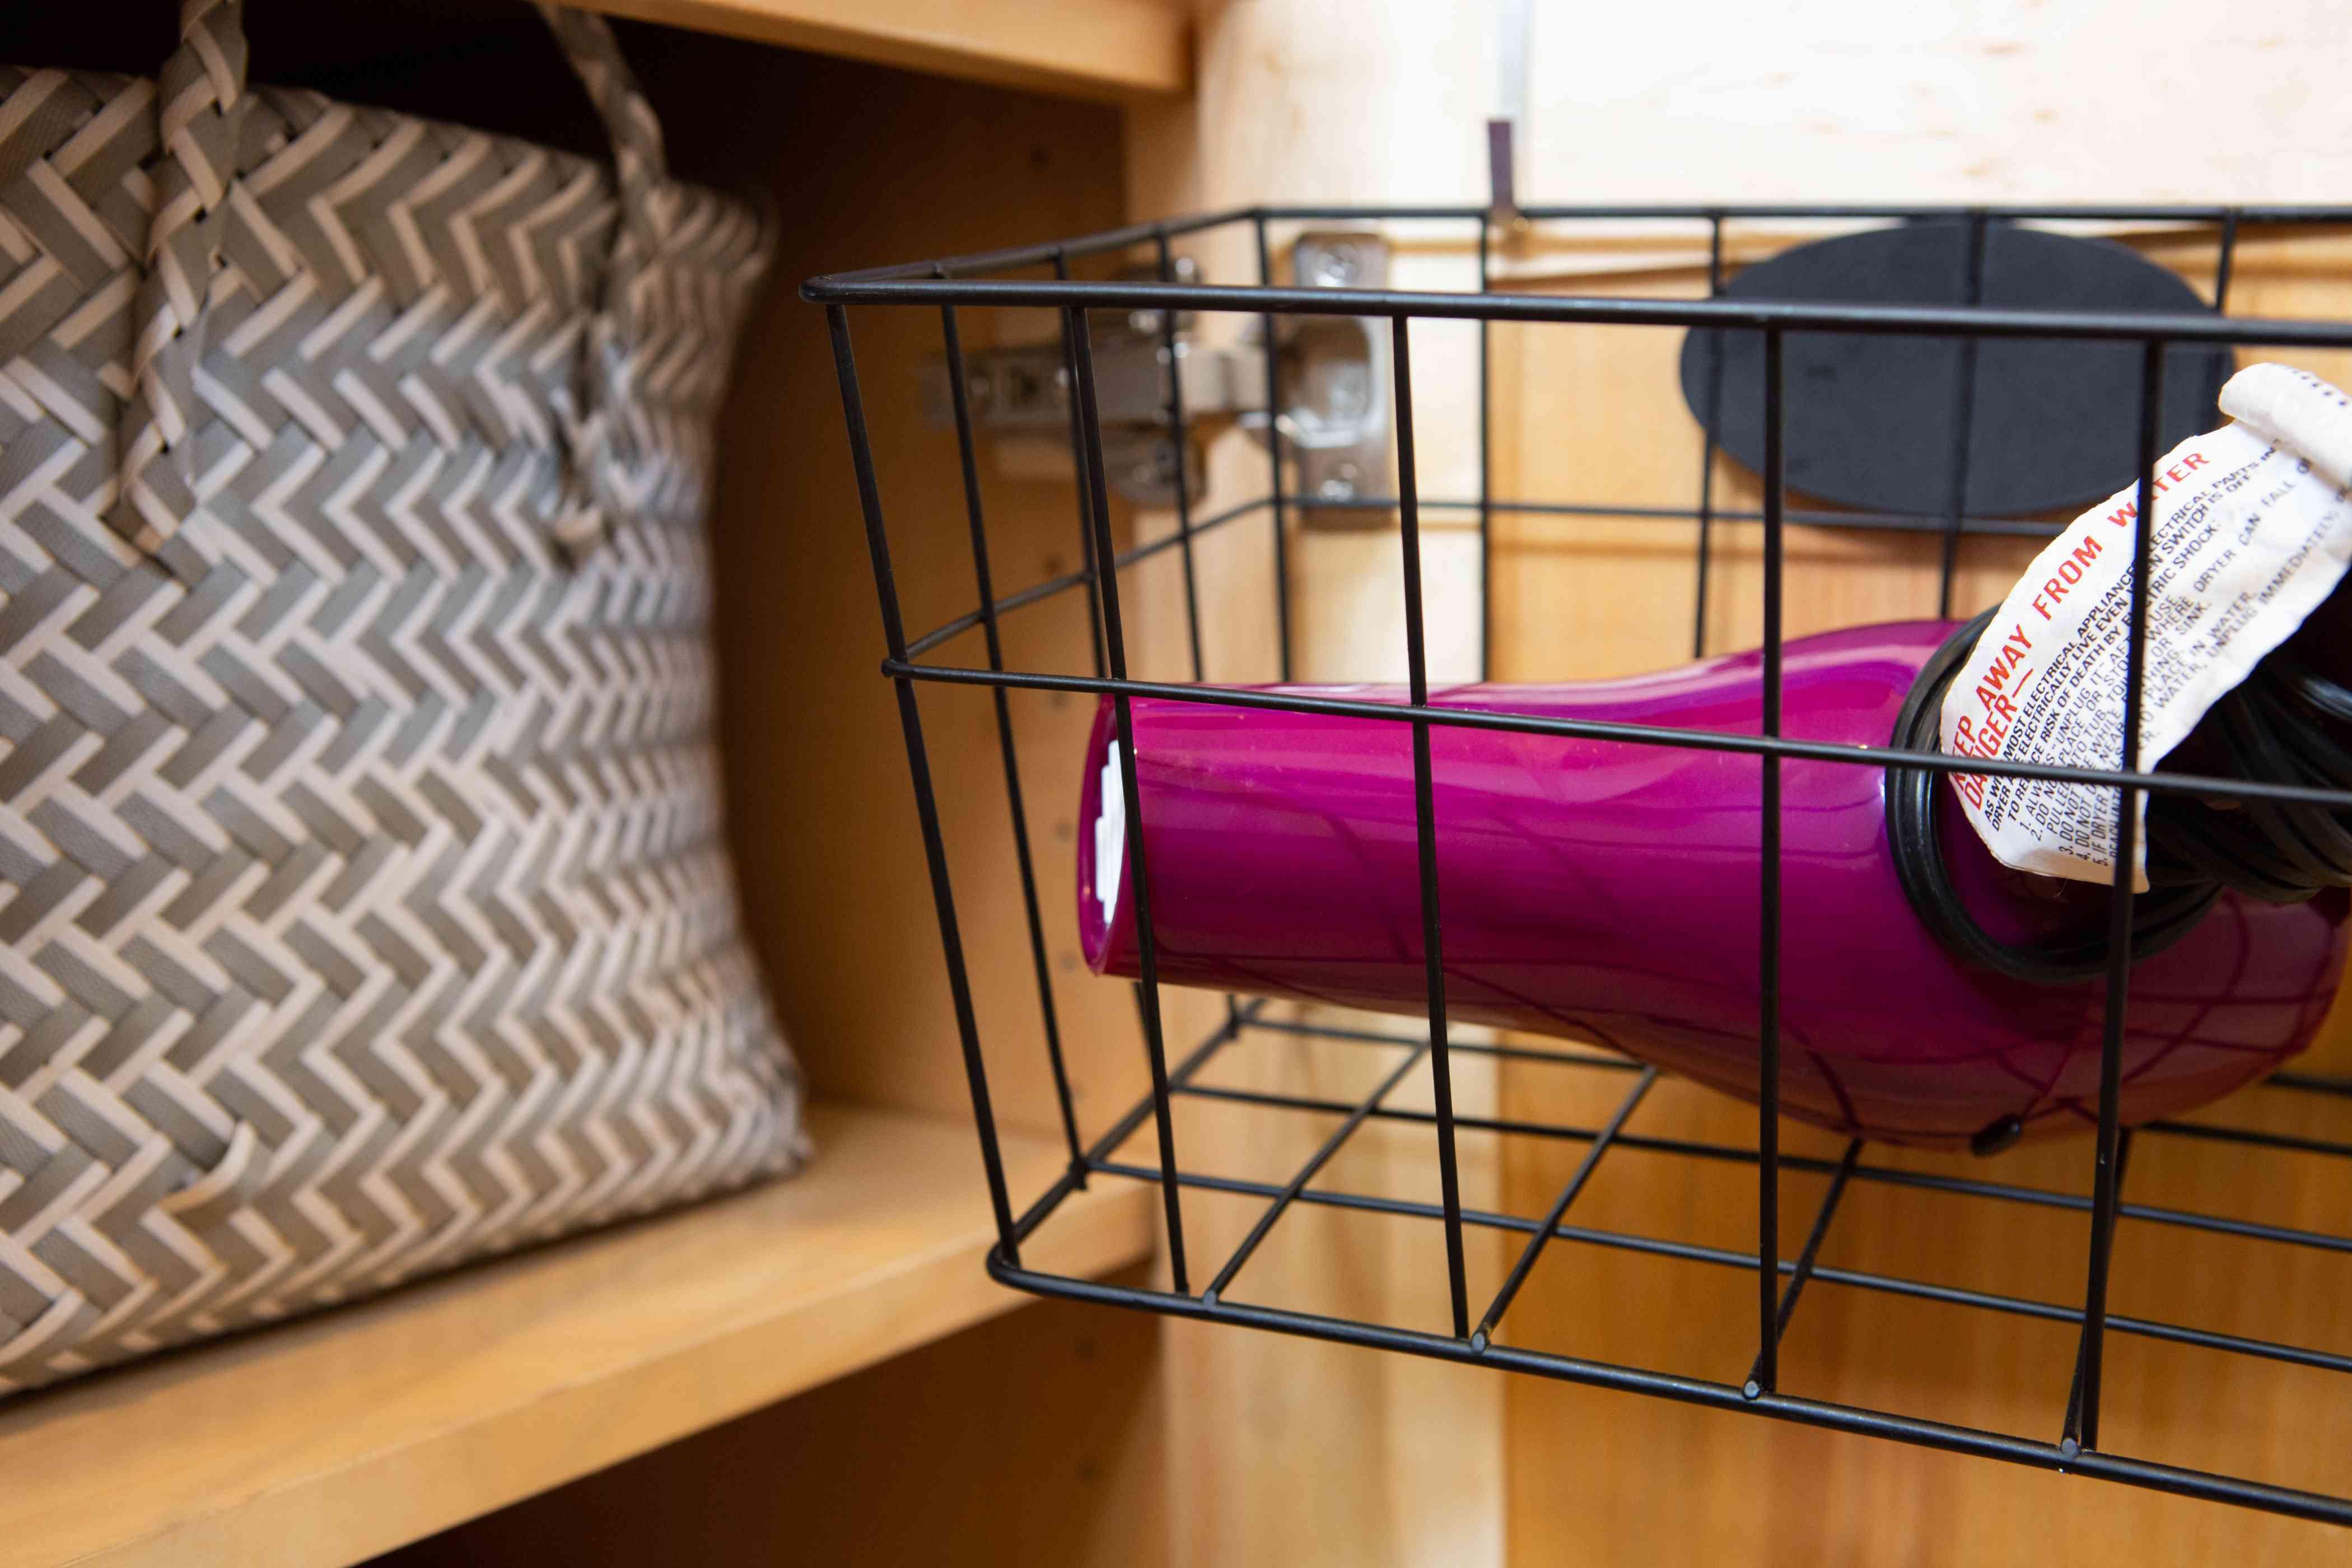 storing a hair dryer inside a cabinet door